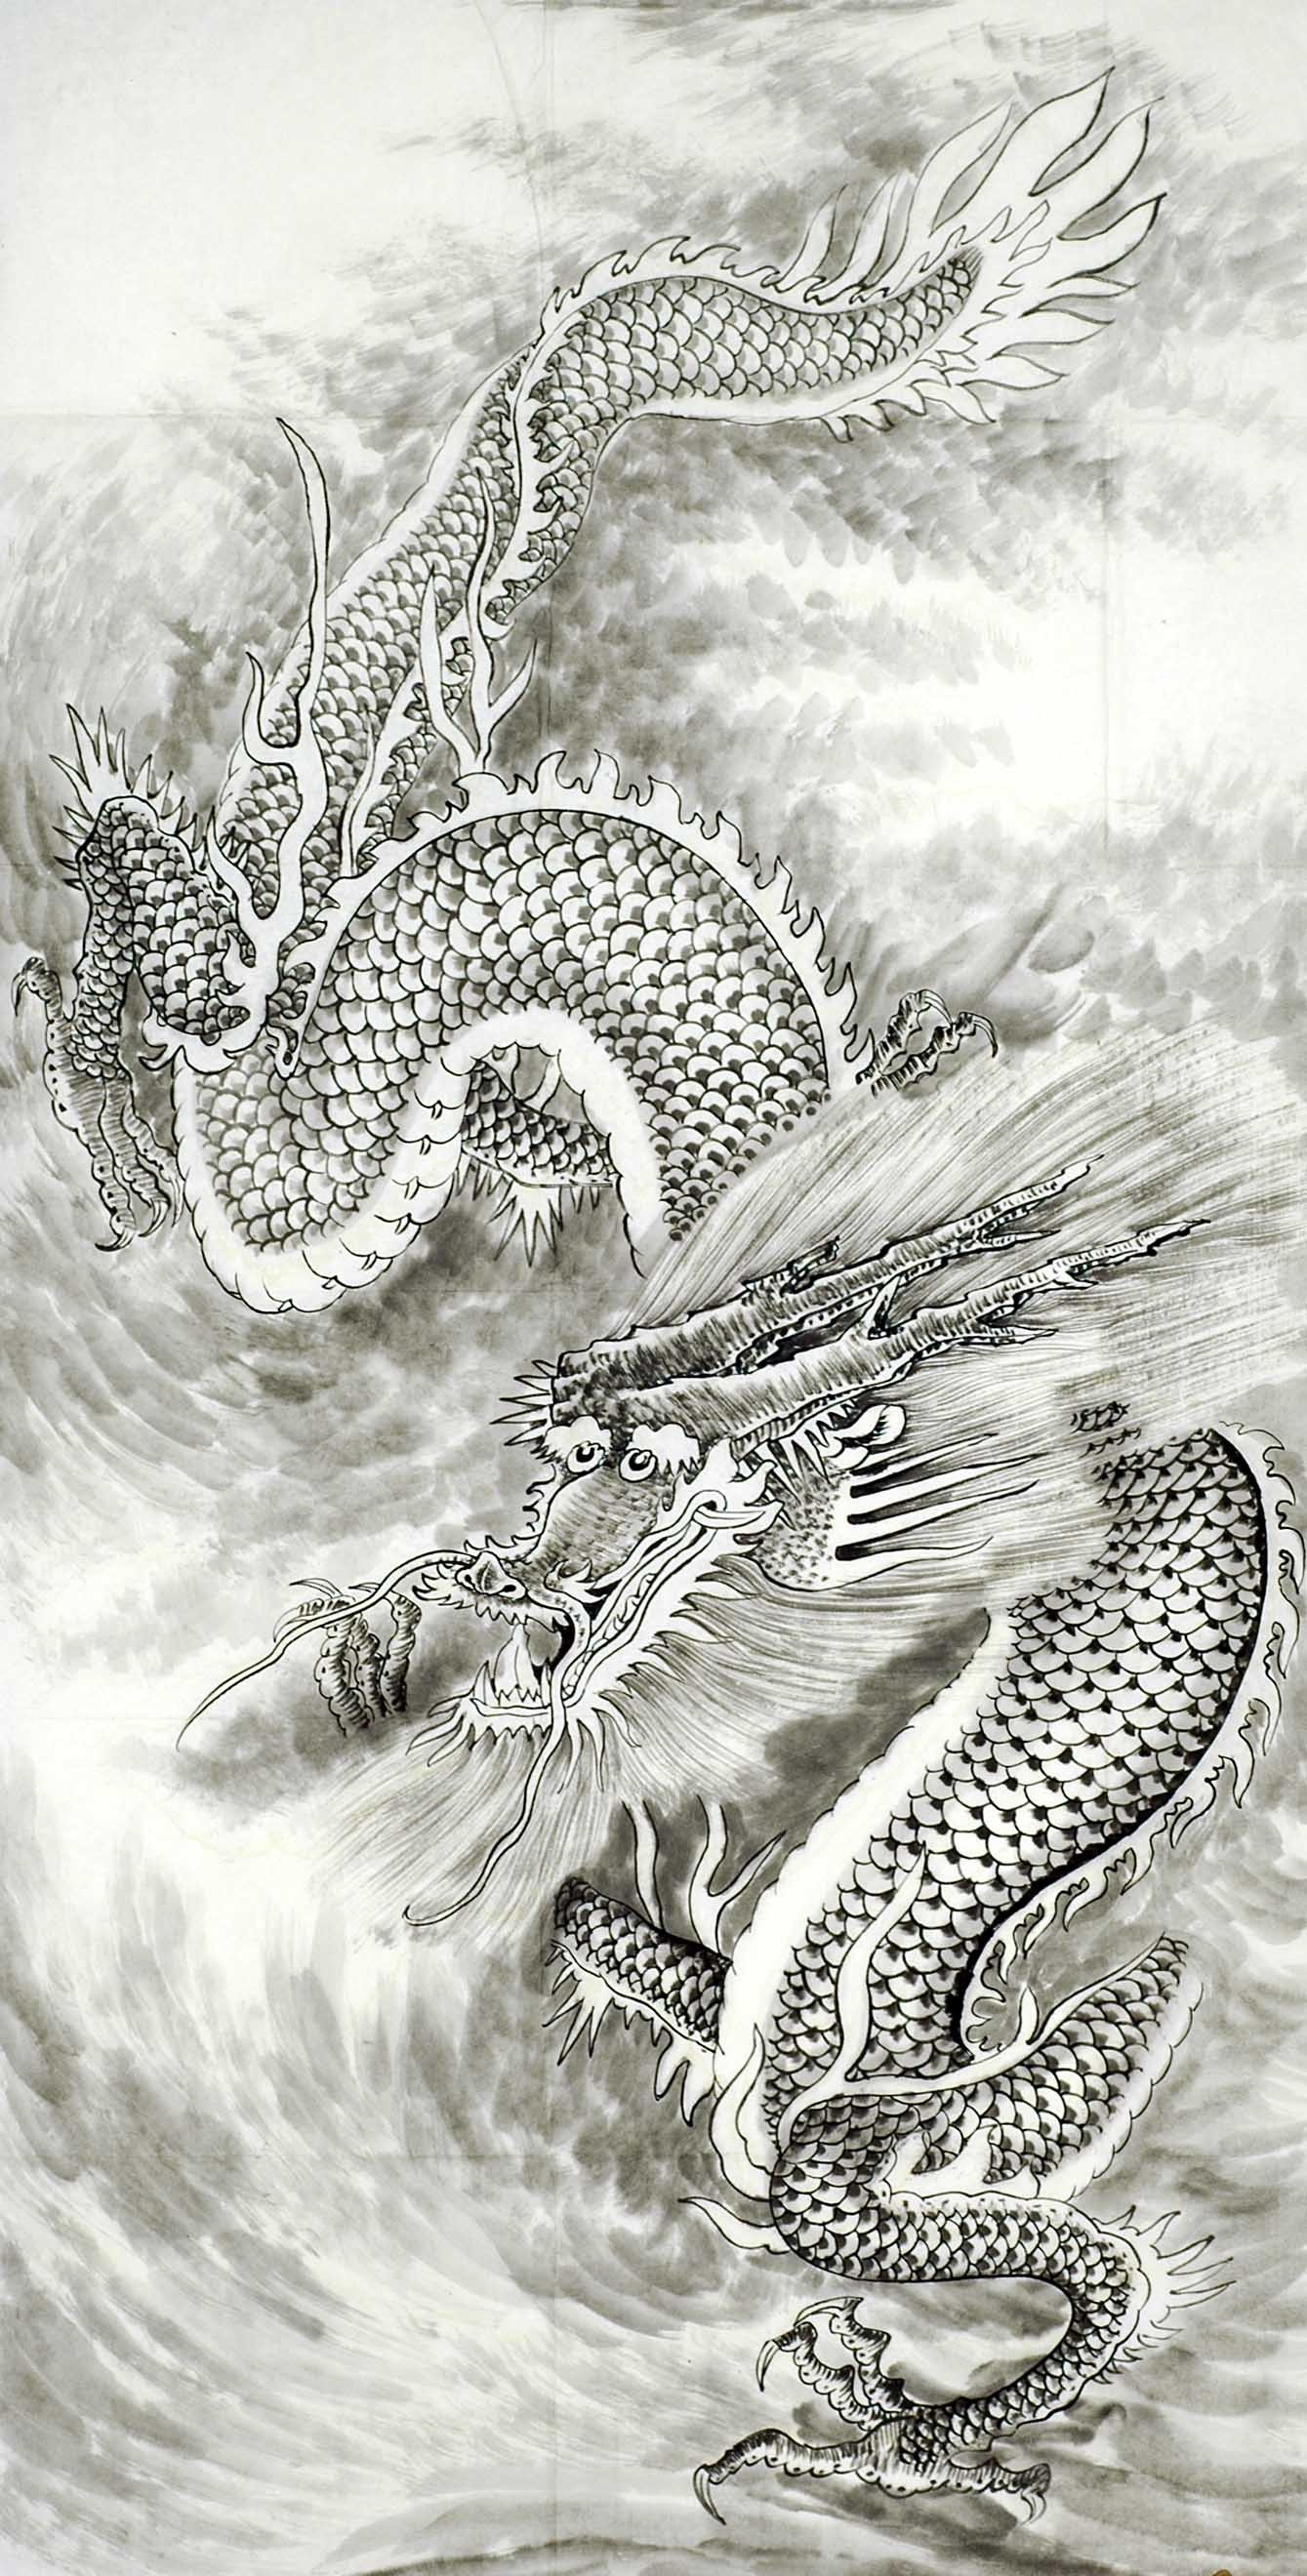 Chinese Dragon Painting - CNAG008718